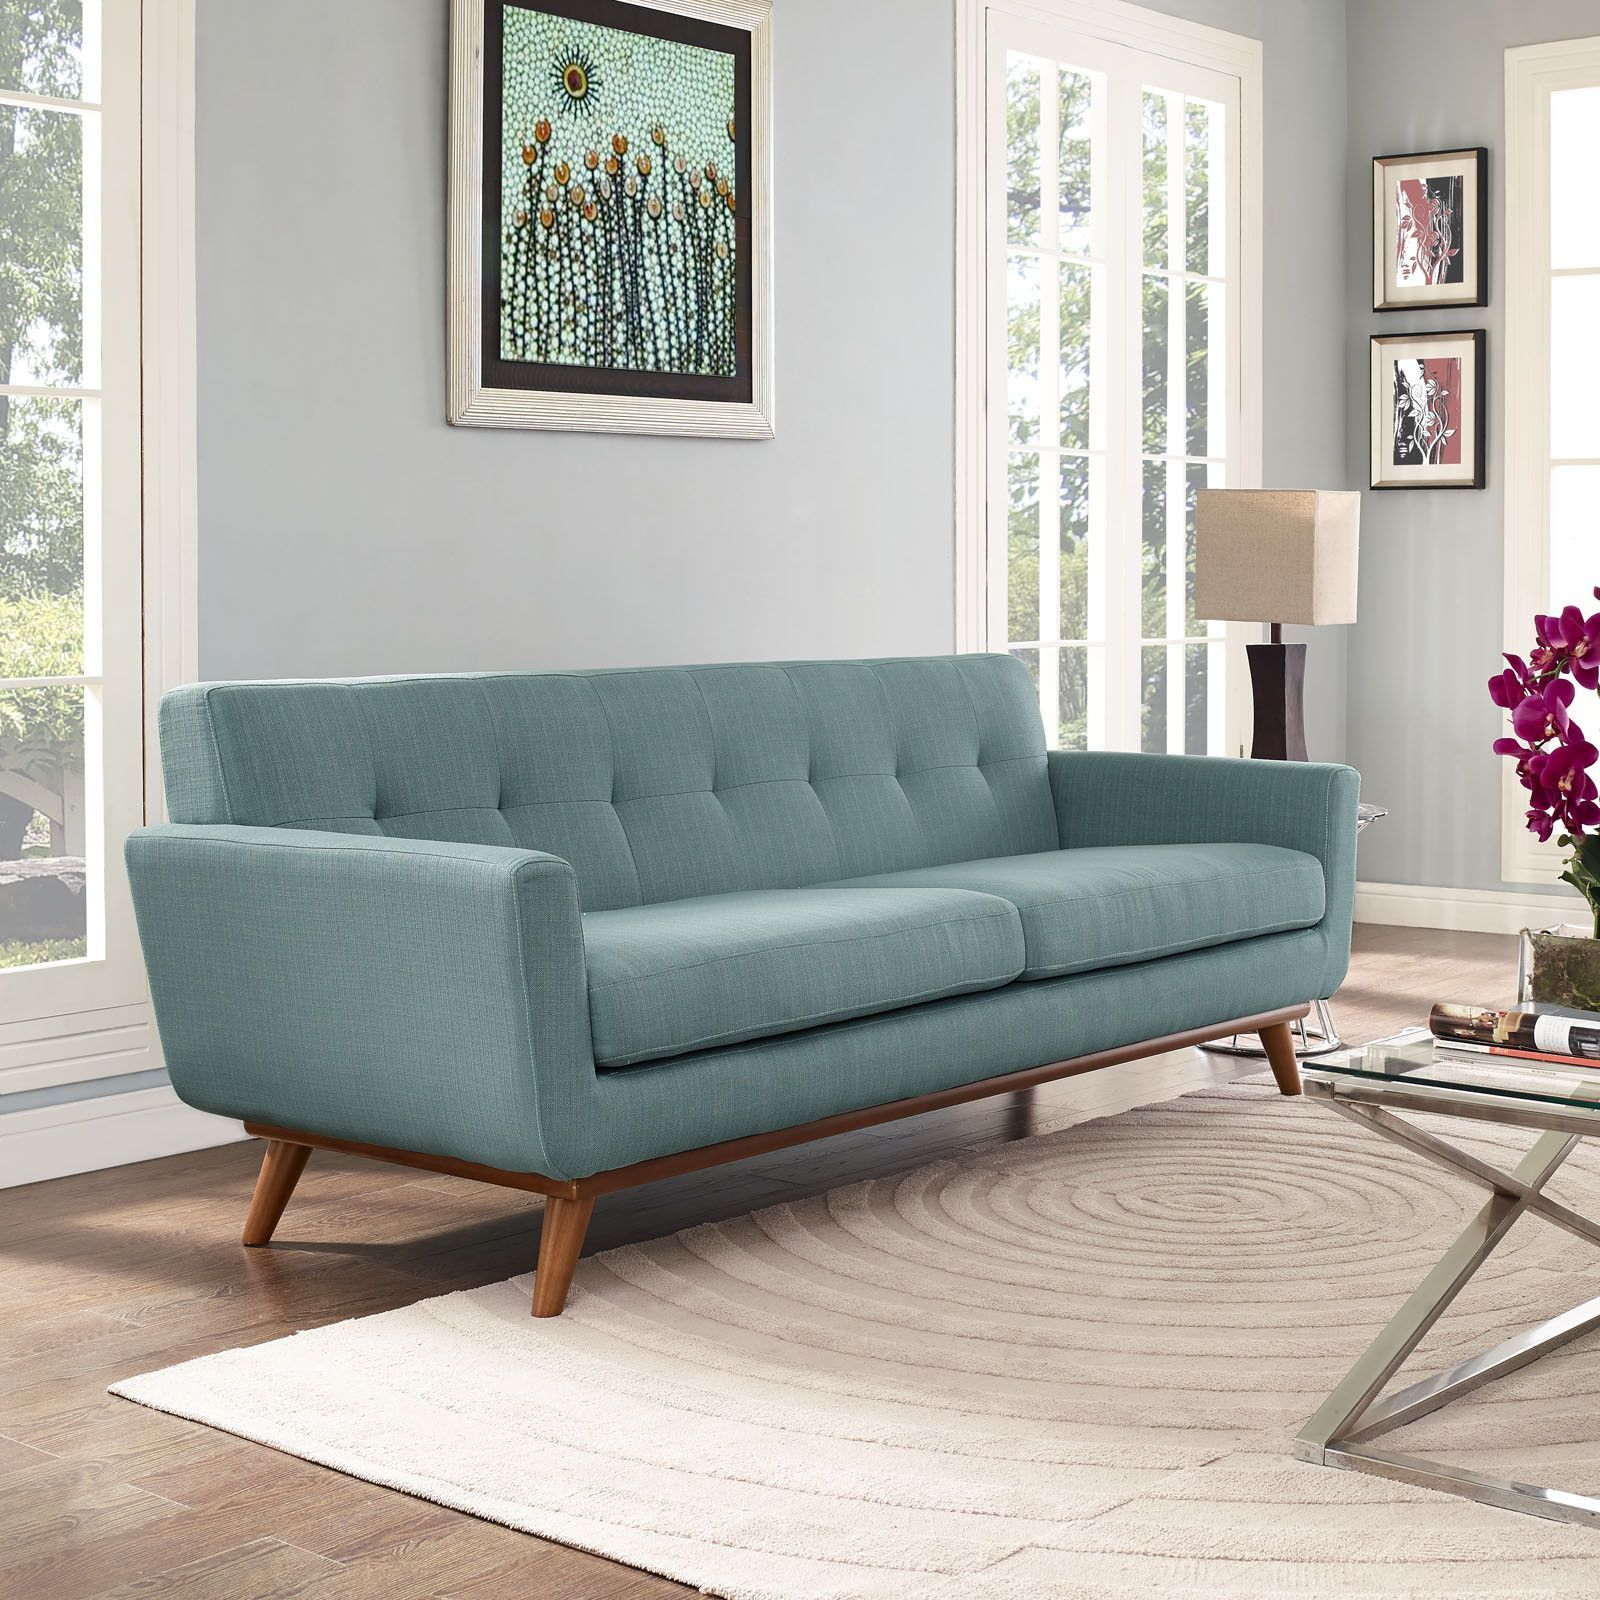 Emory Upholstered Sofa Laguna Upholstered Sofa Modern Sofa